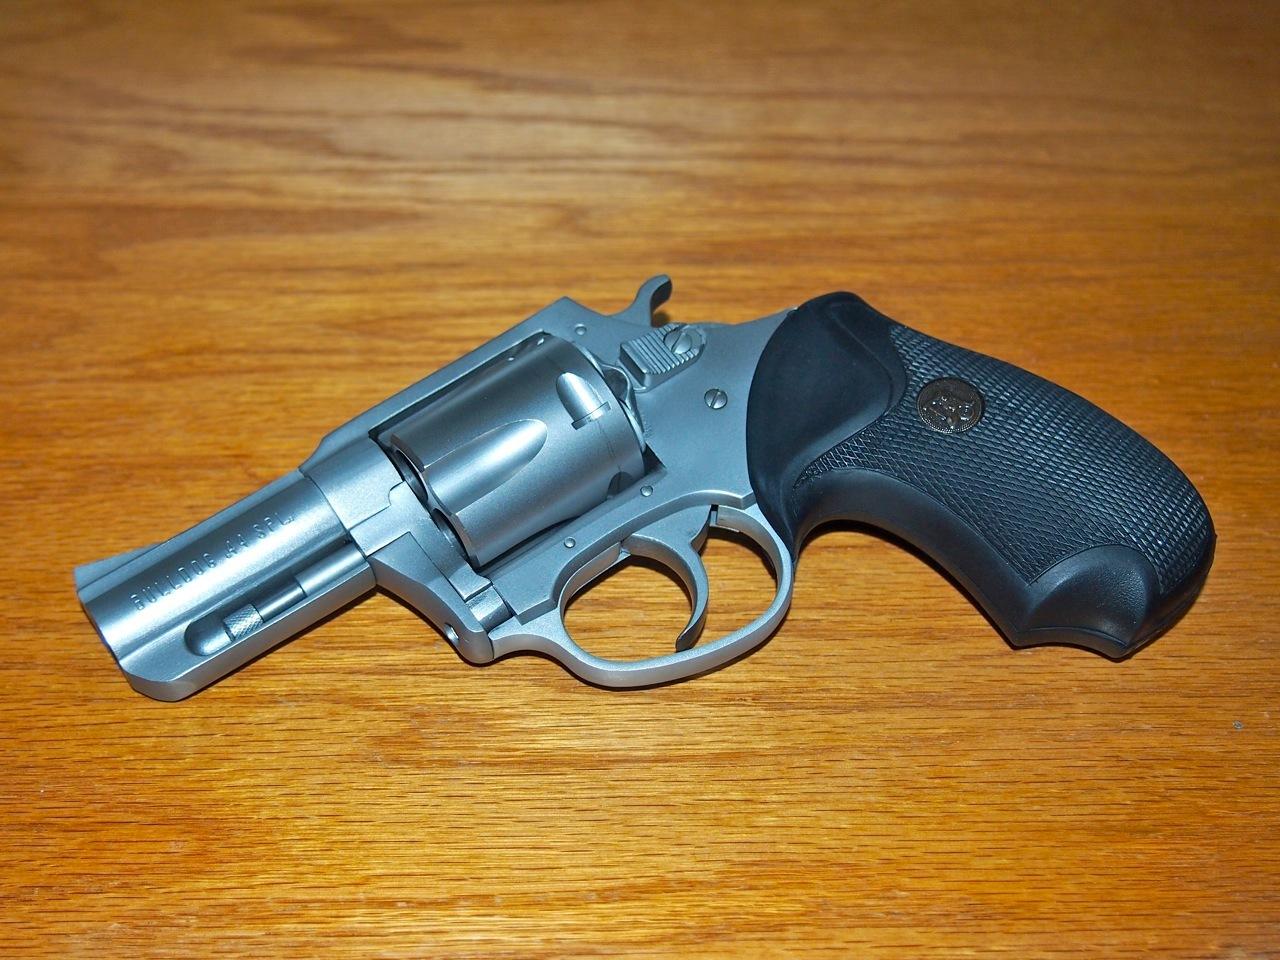 Charter arms revolvers-bulldog3.jpg